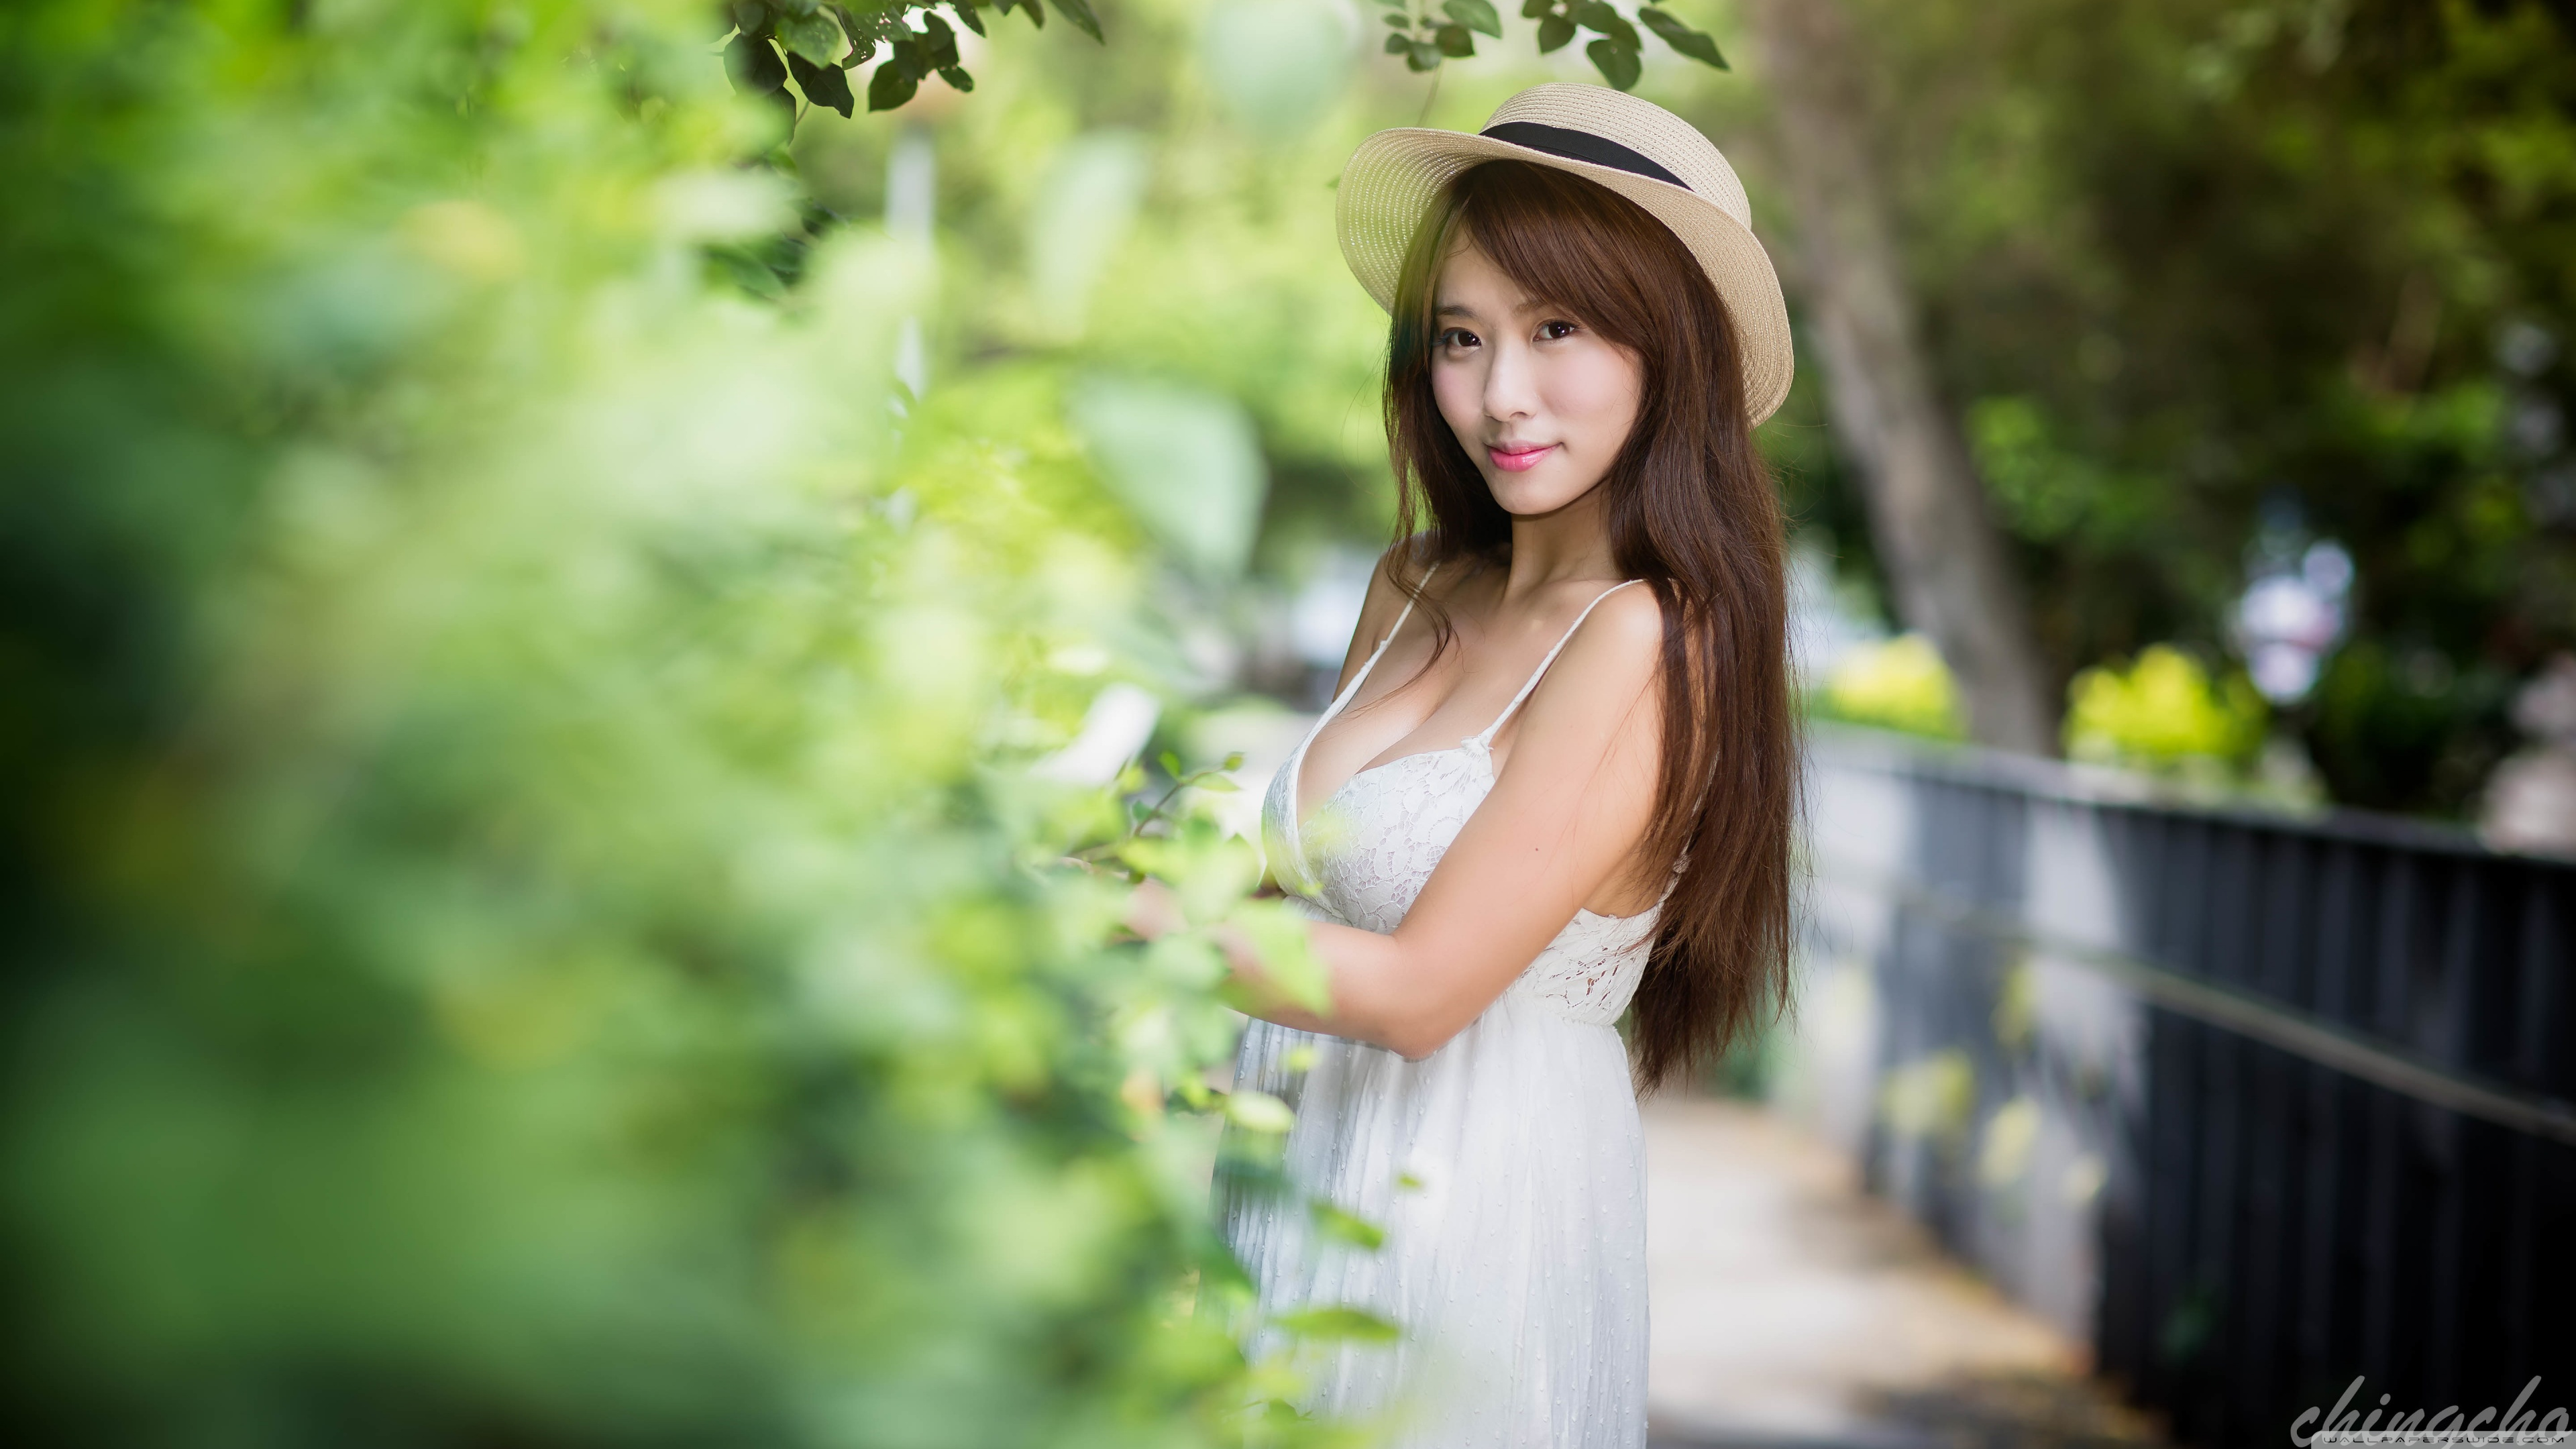 Asian Model Wallpaper